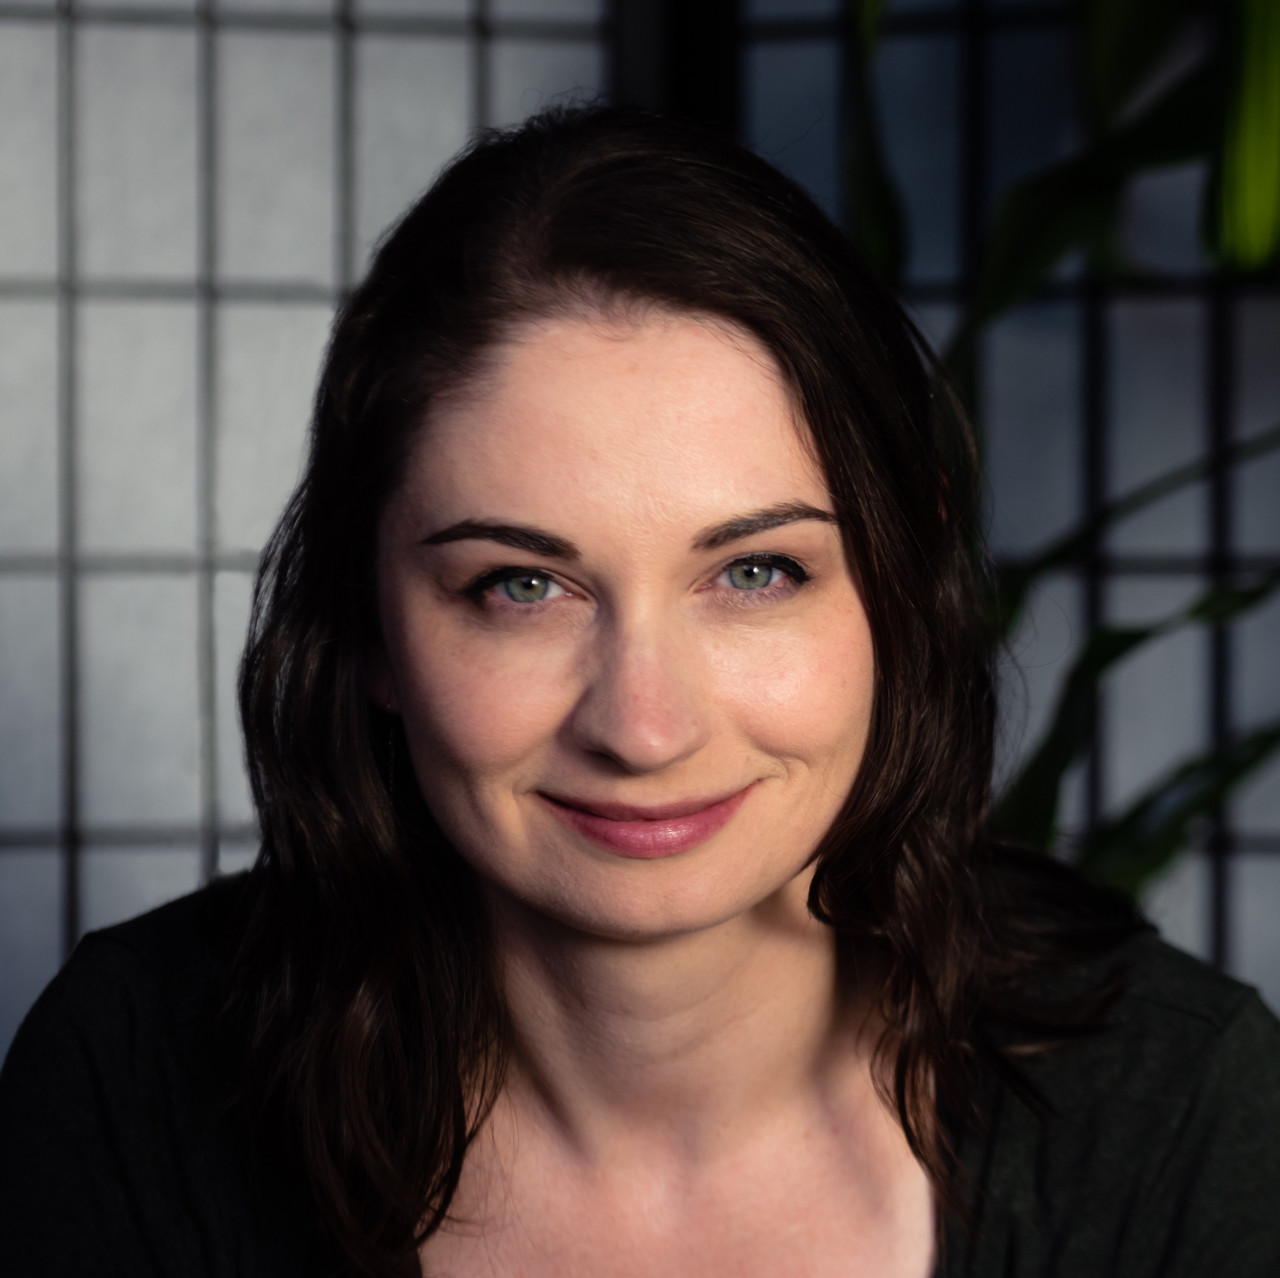 Catherine Liggett smiling headshot